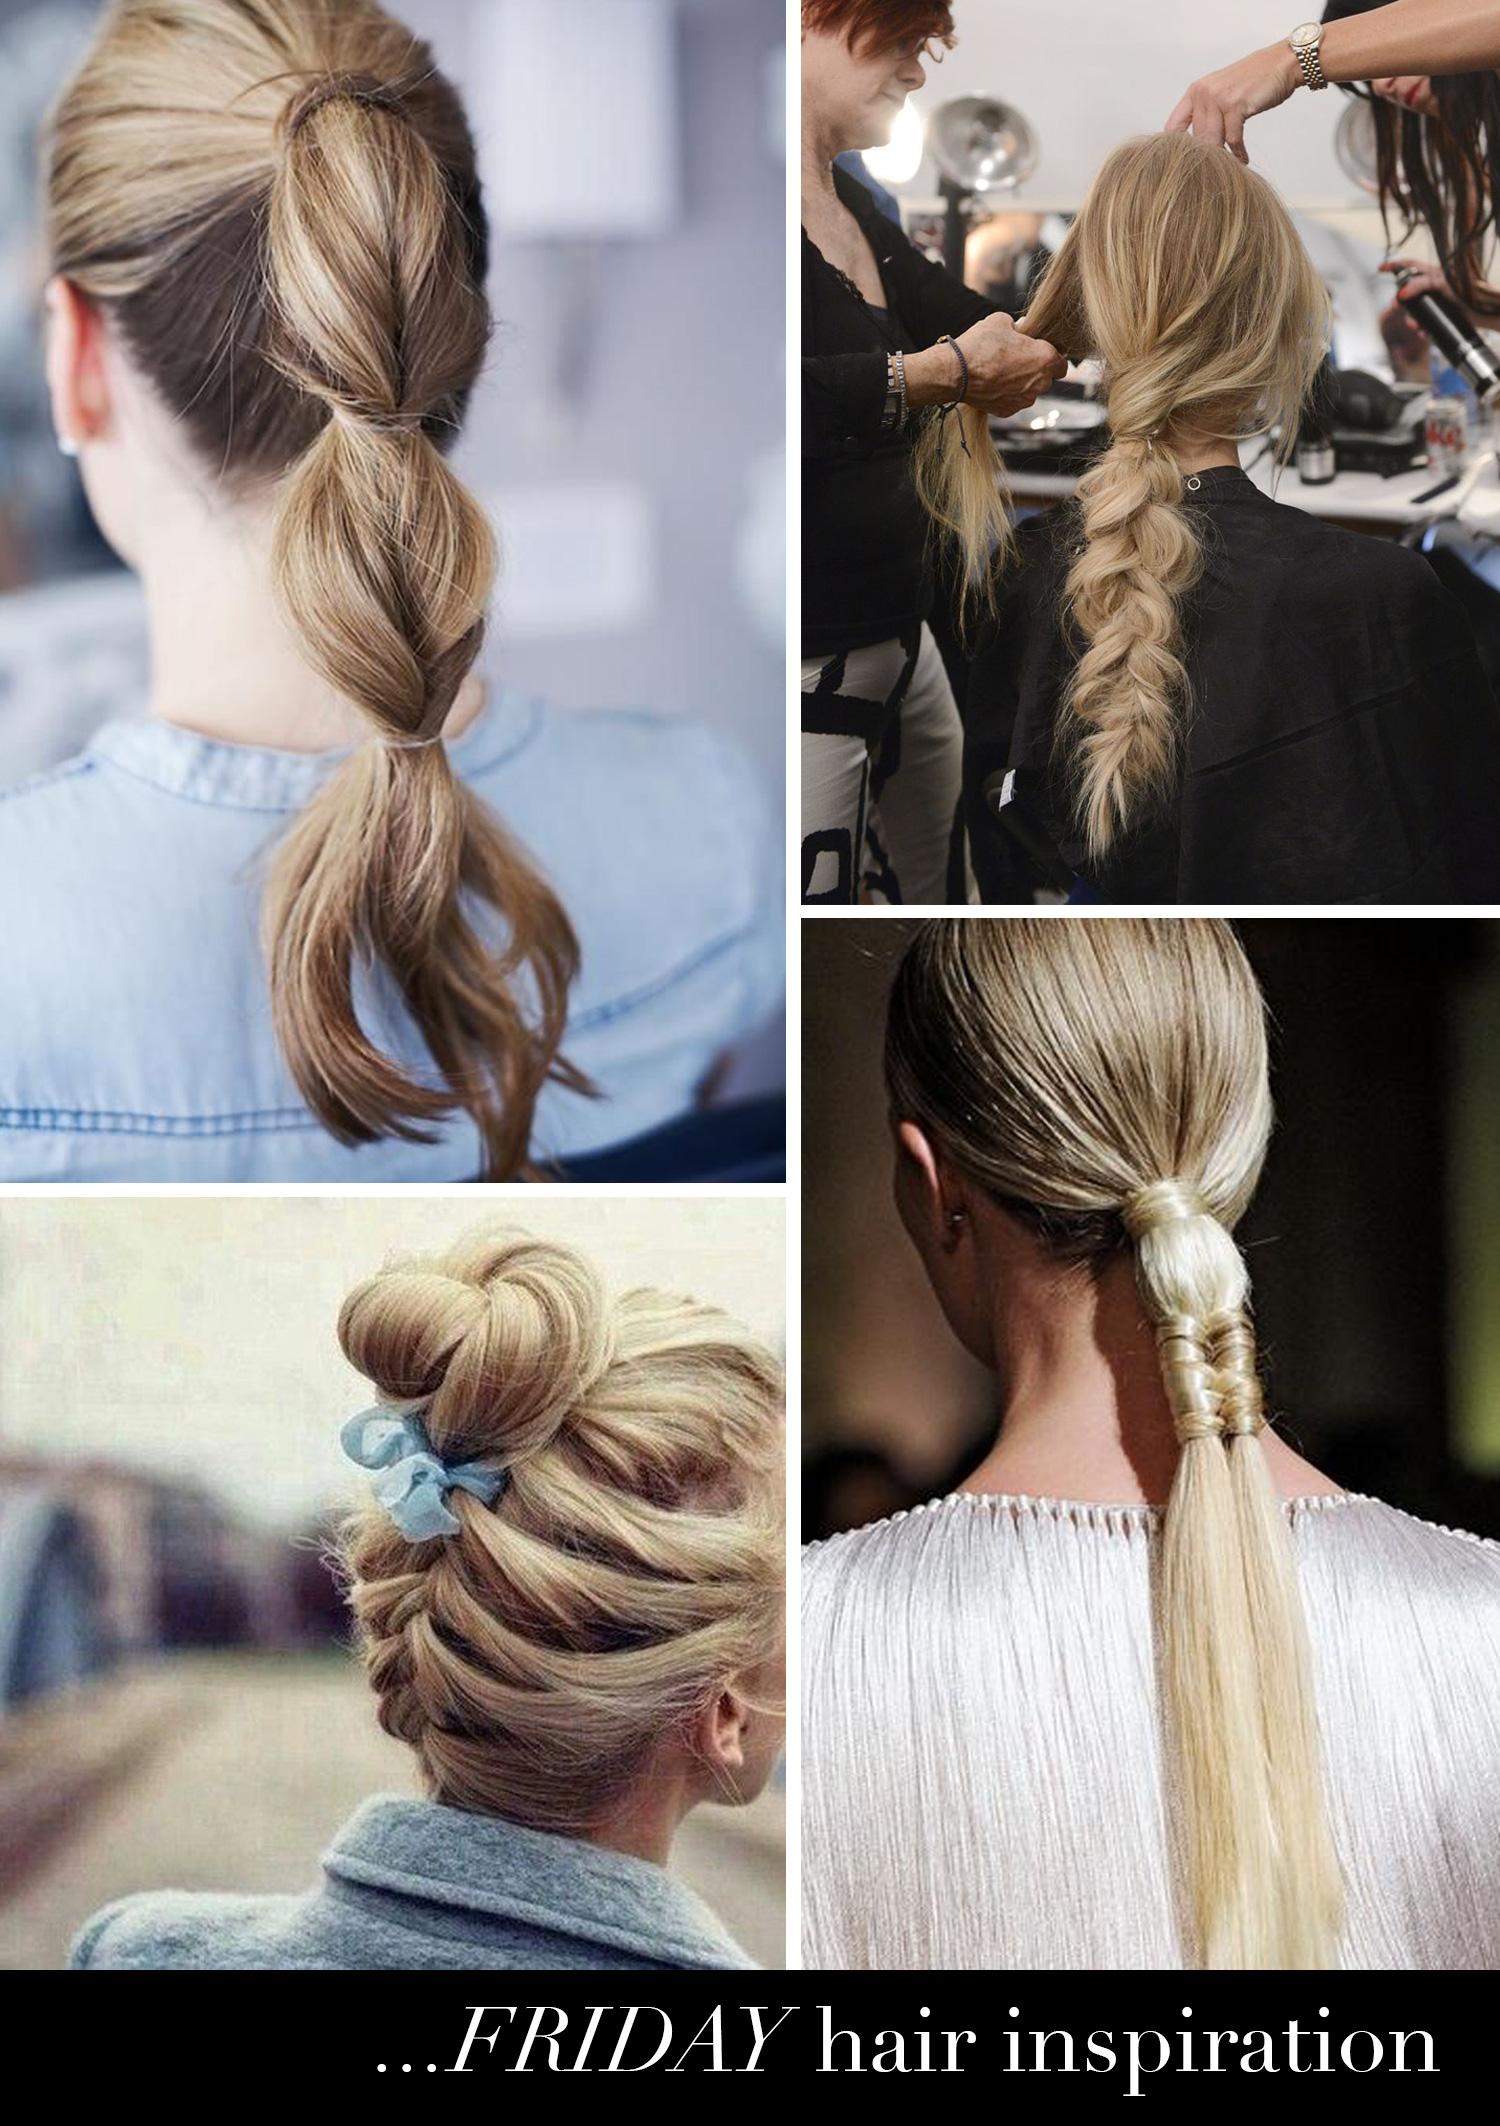 hair-inspiration@2x